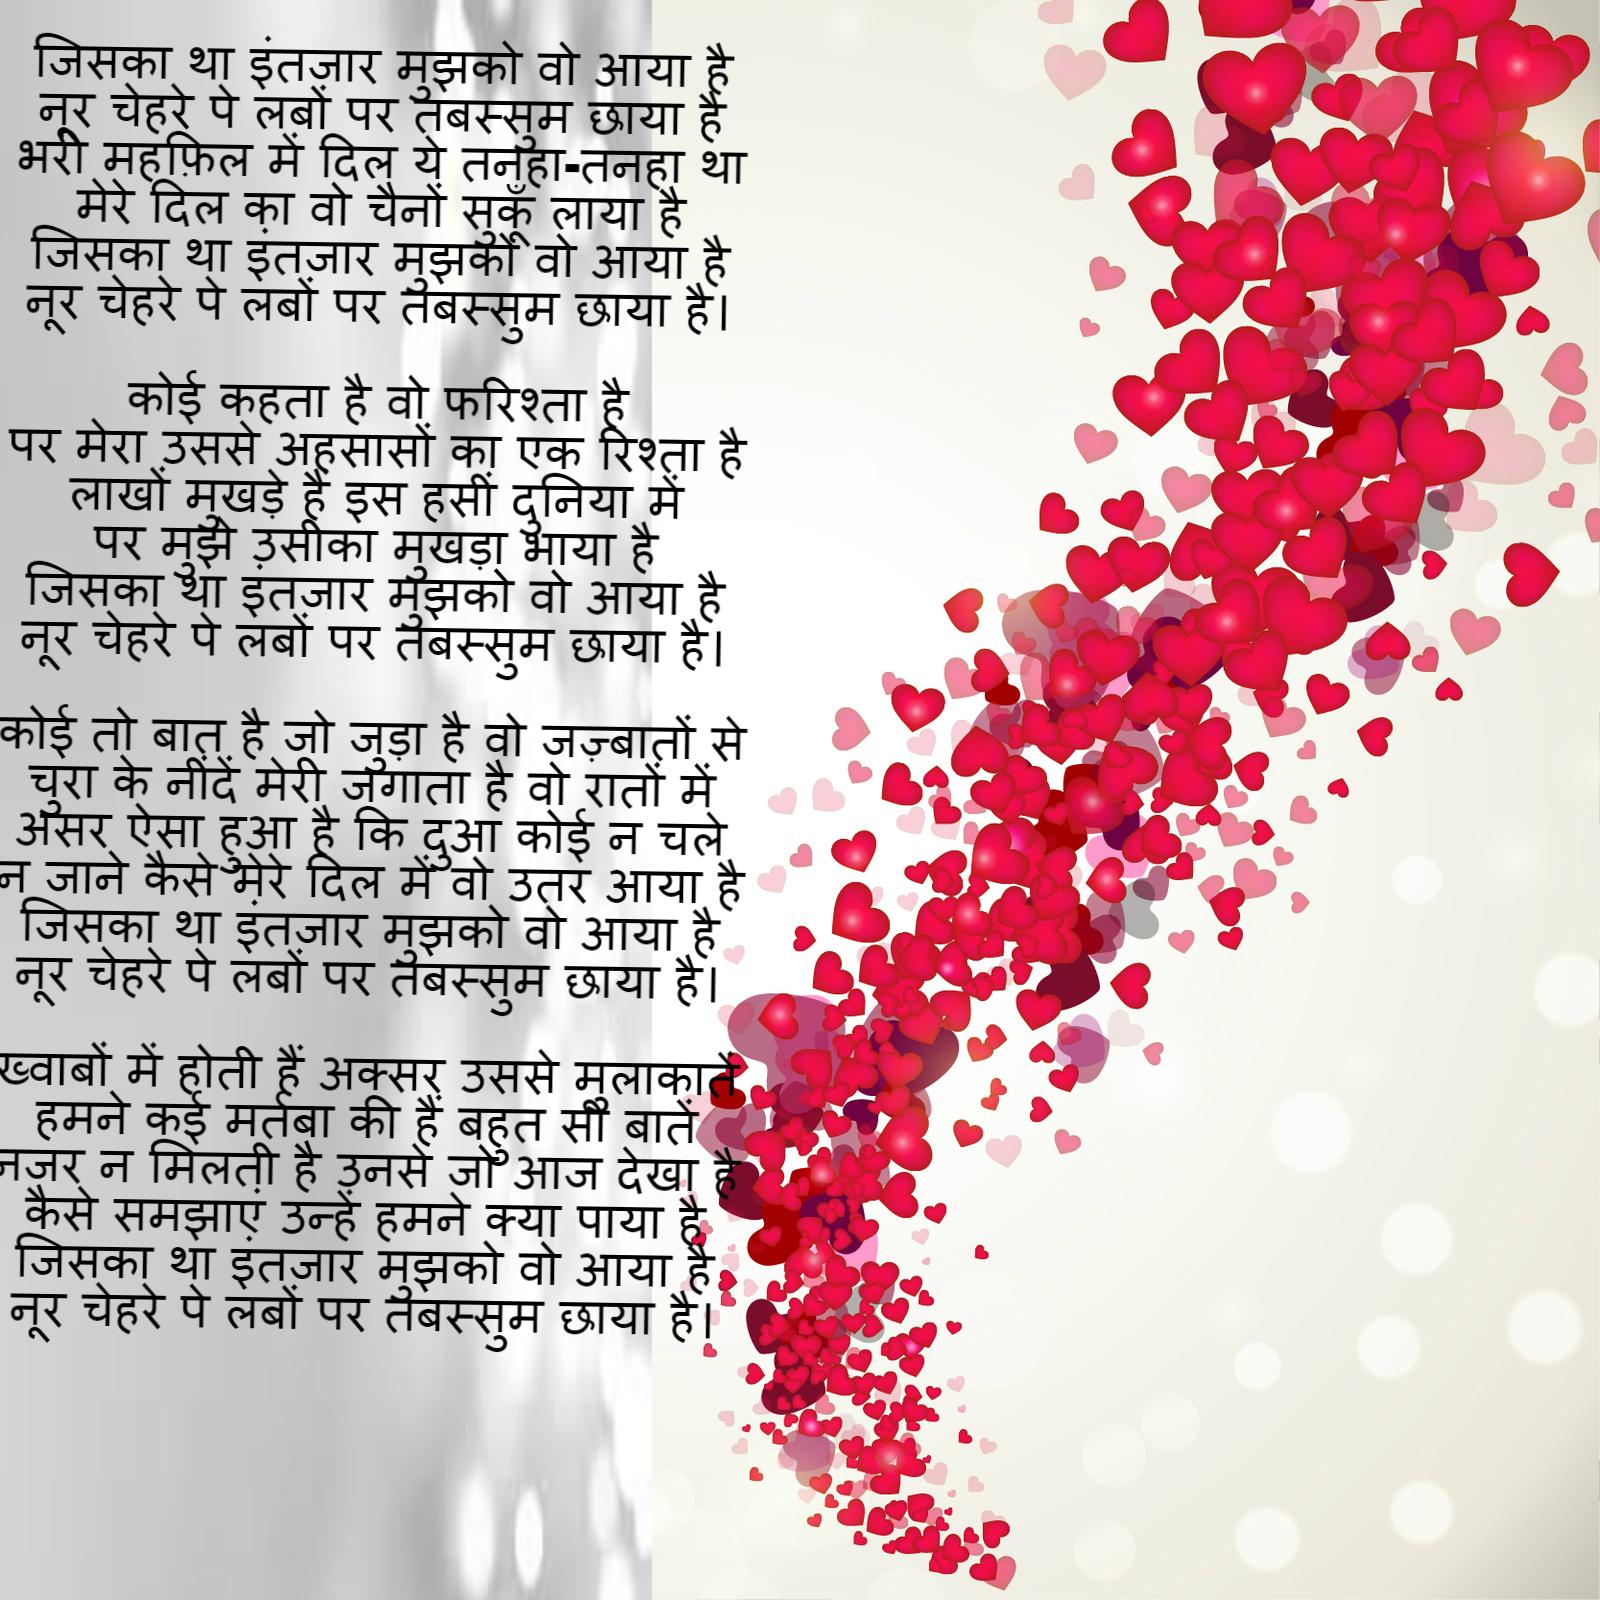 Bengali Heart Touching Quotes: Dil Ko Rula Dene Wali Love Kabita In Hindi